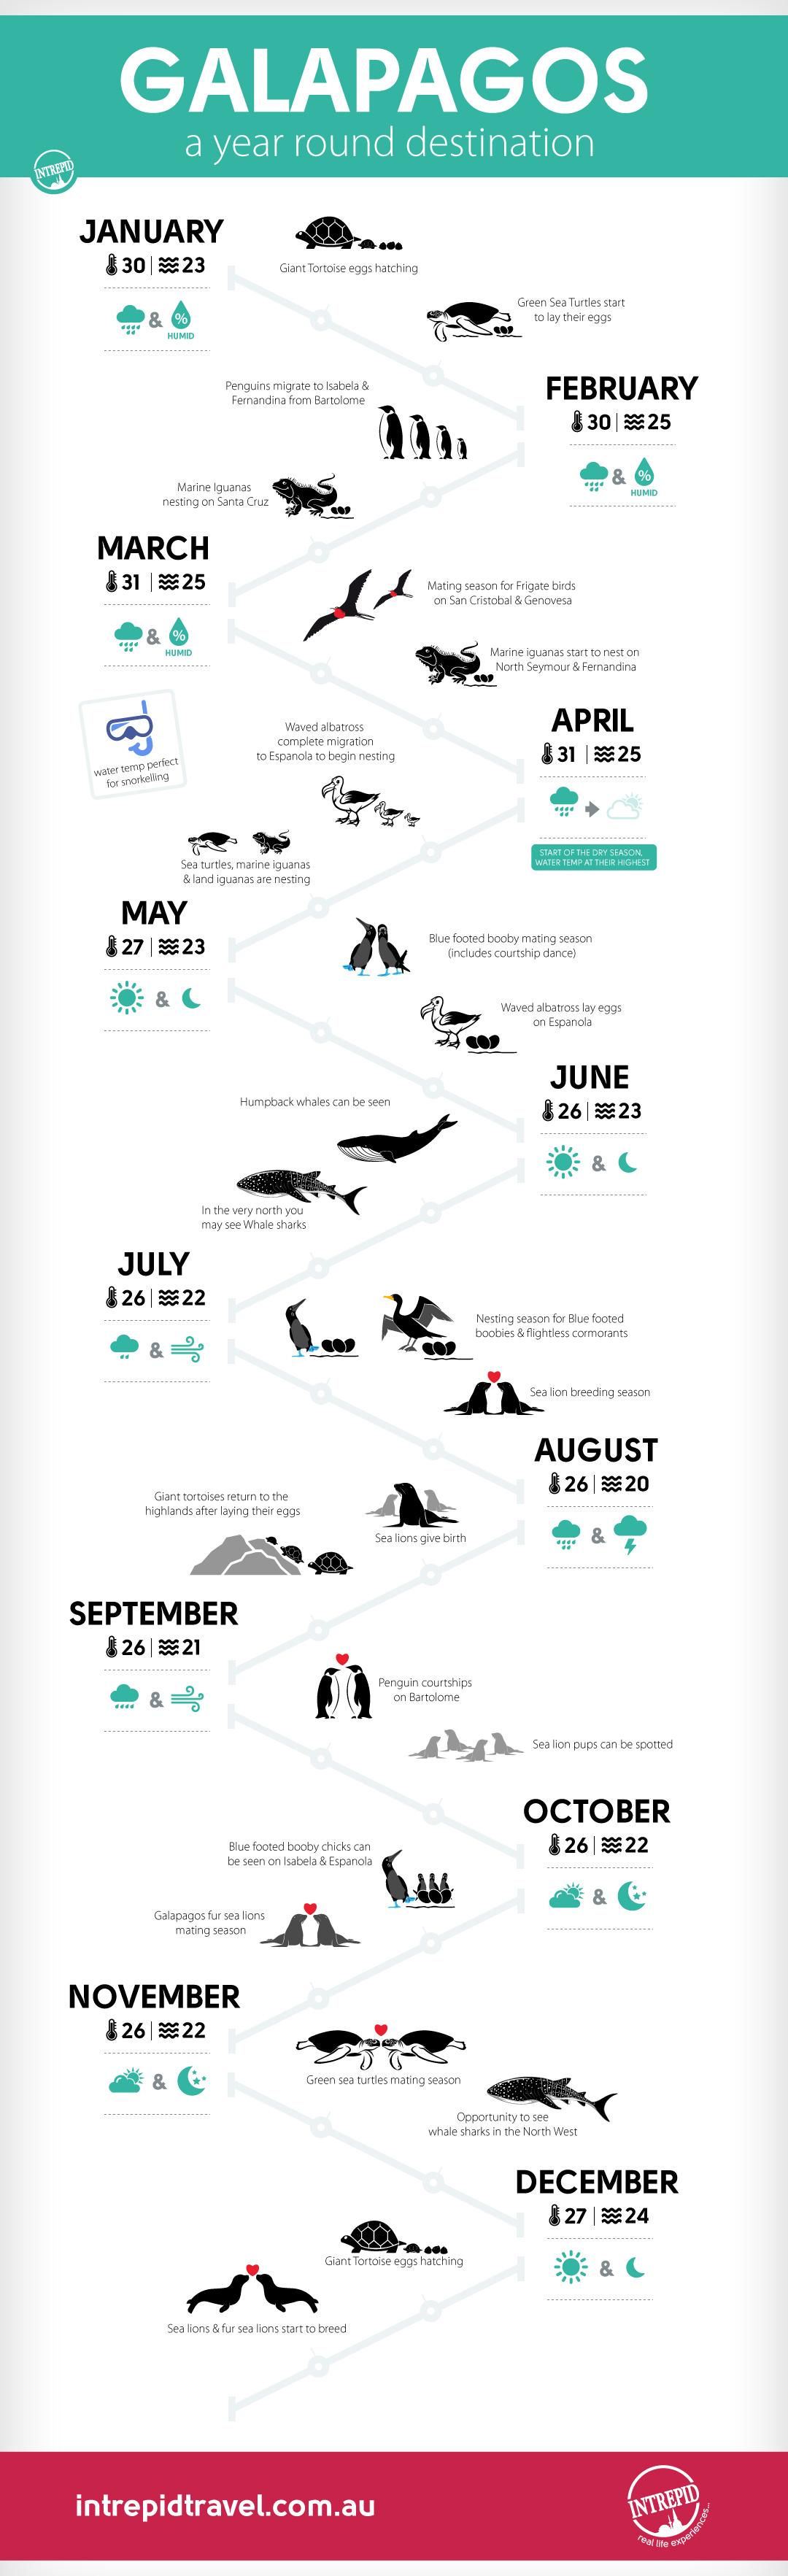 Islas Galápagos - Infografía